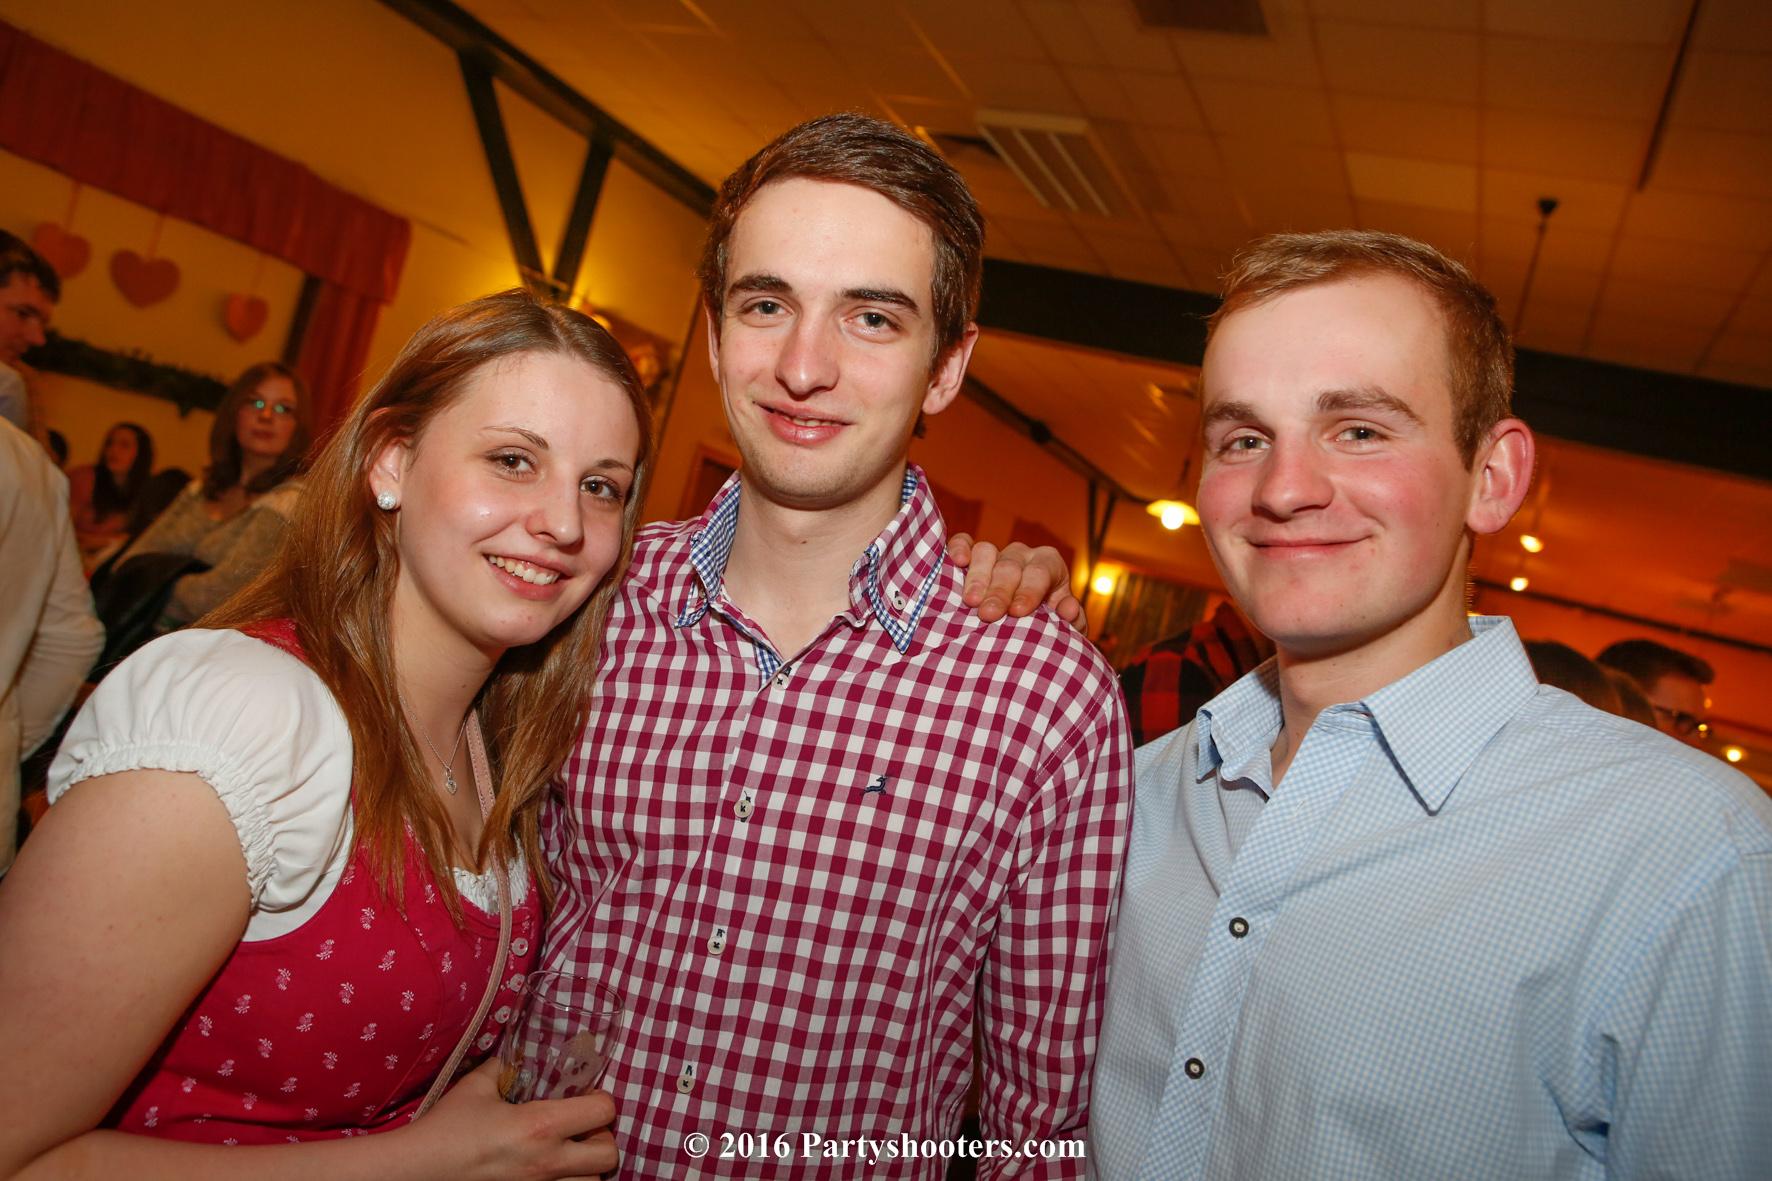 0103 - 4085 - Fruehlingsball Aspach